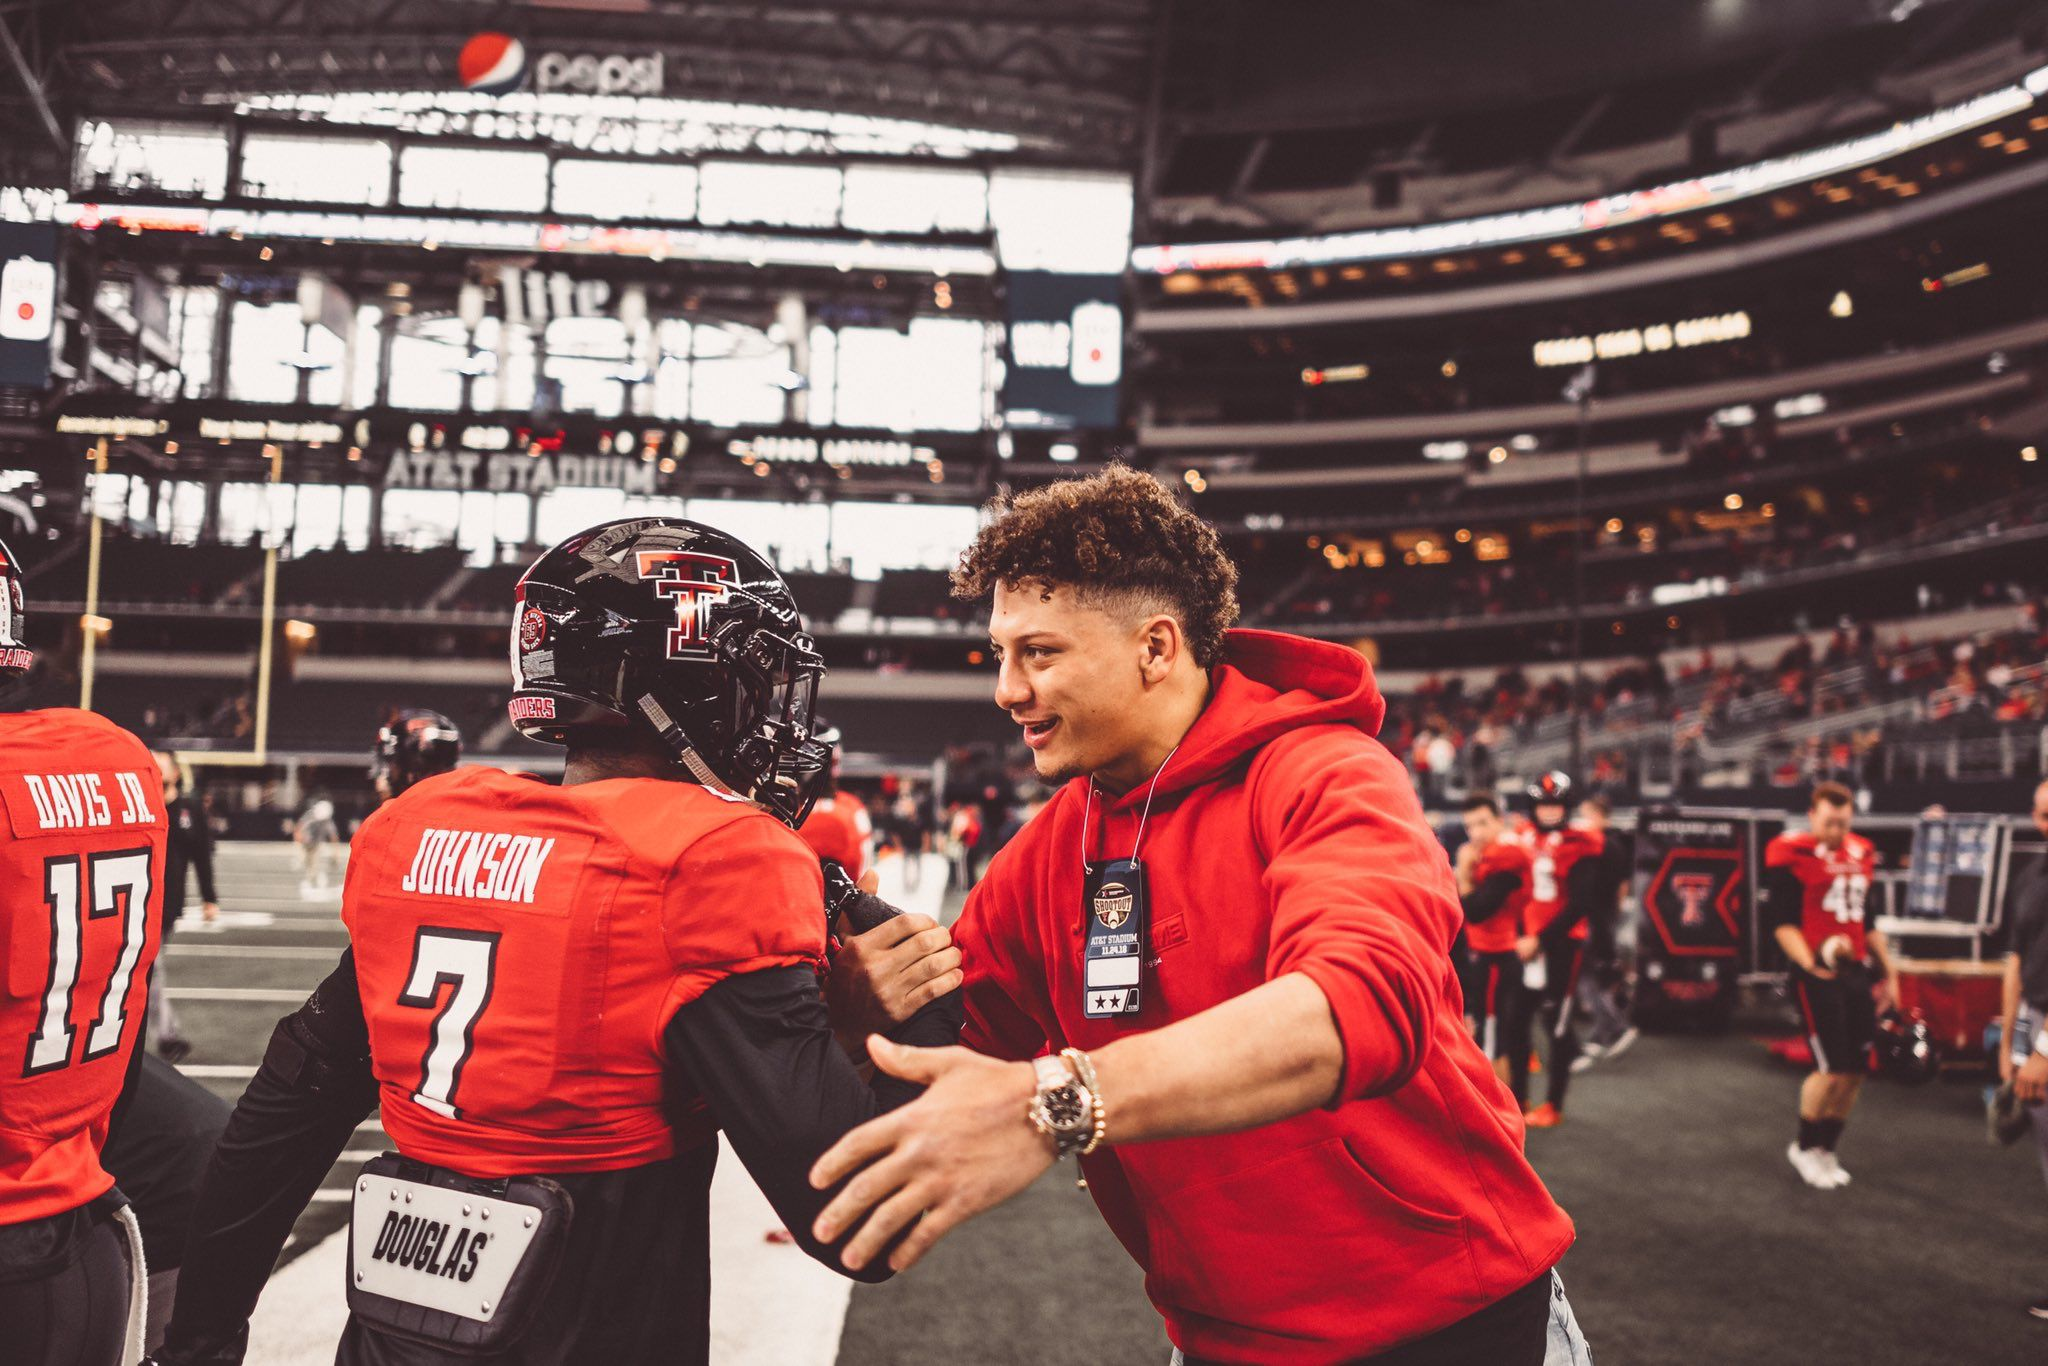 Pin By Levi Tucker On Sports Texas Tech Football Best Football Team Kc Chiefs